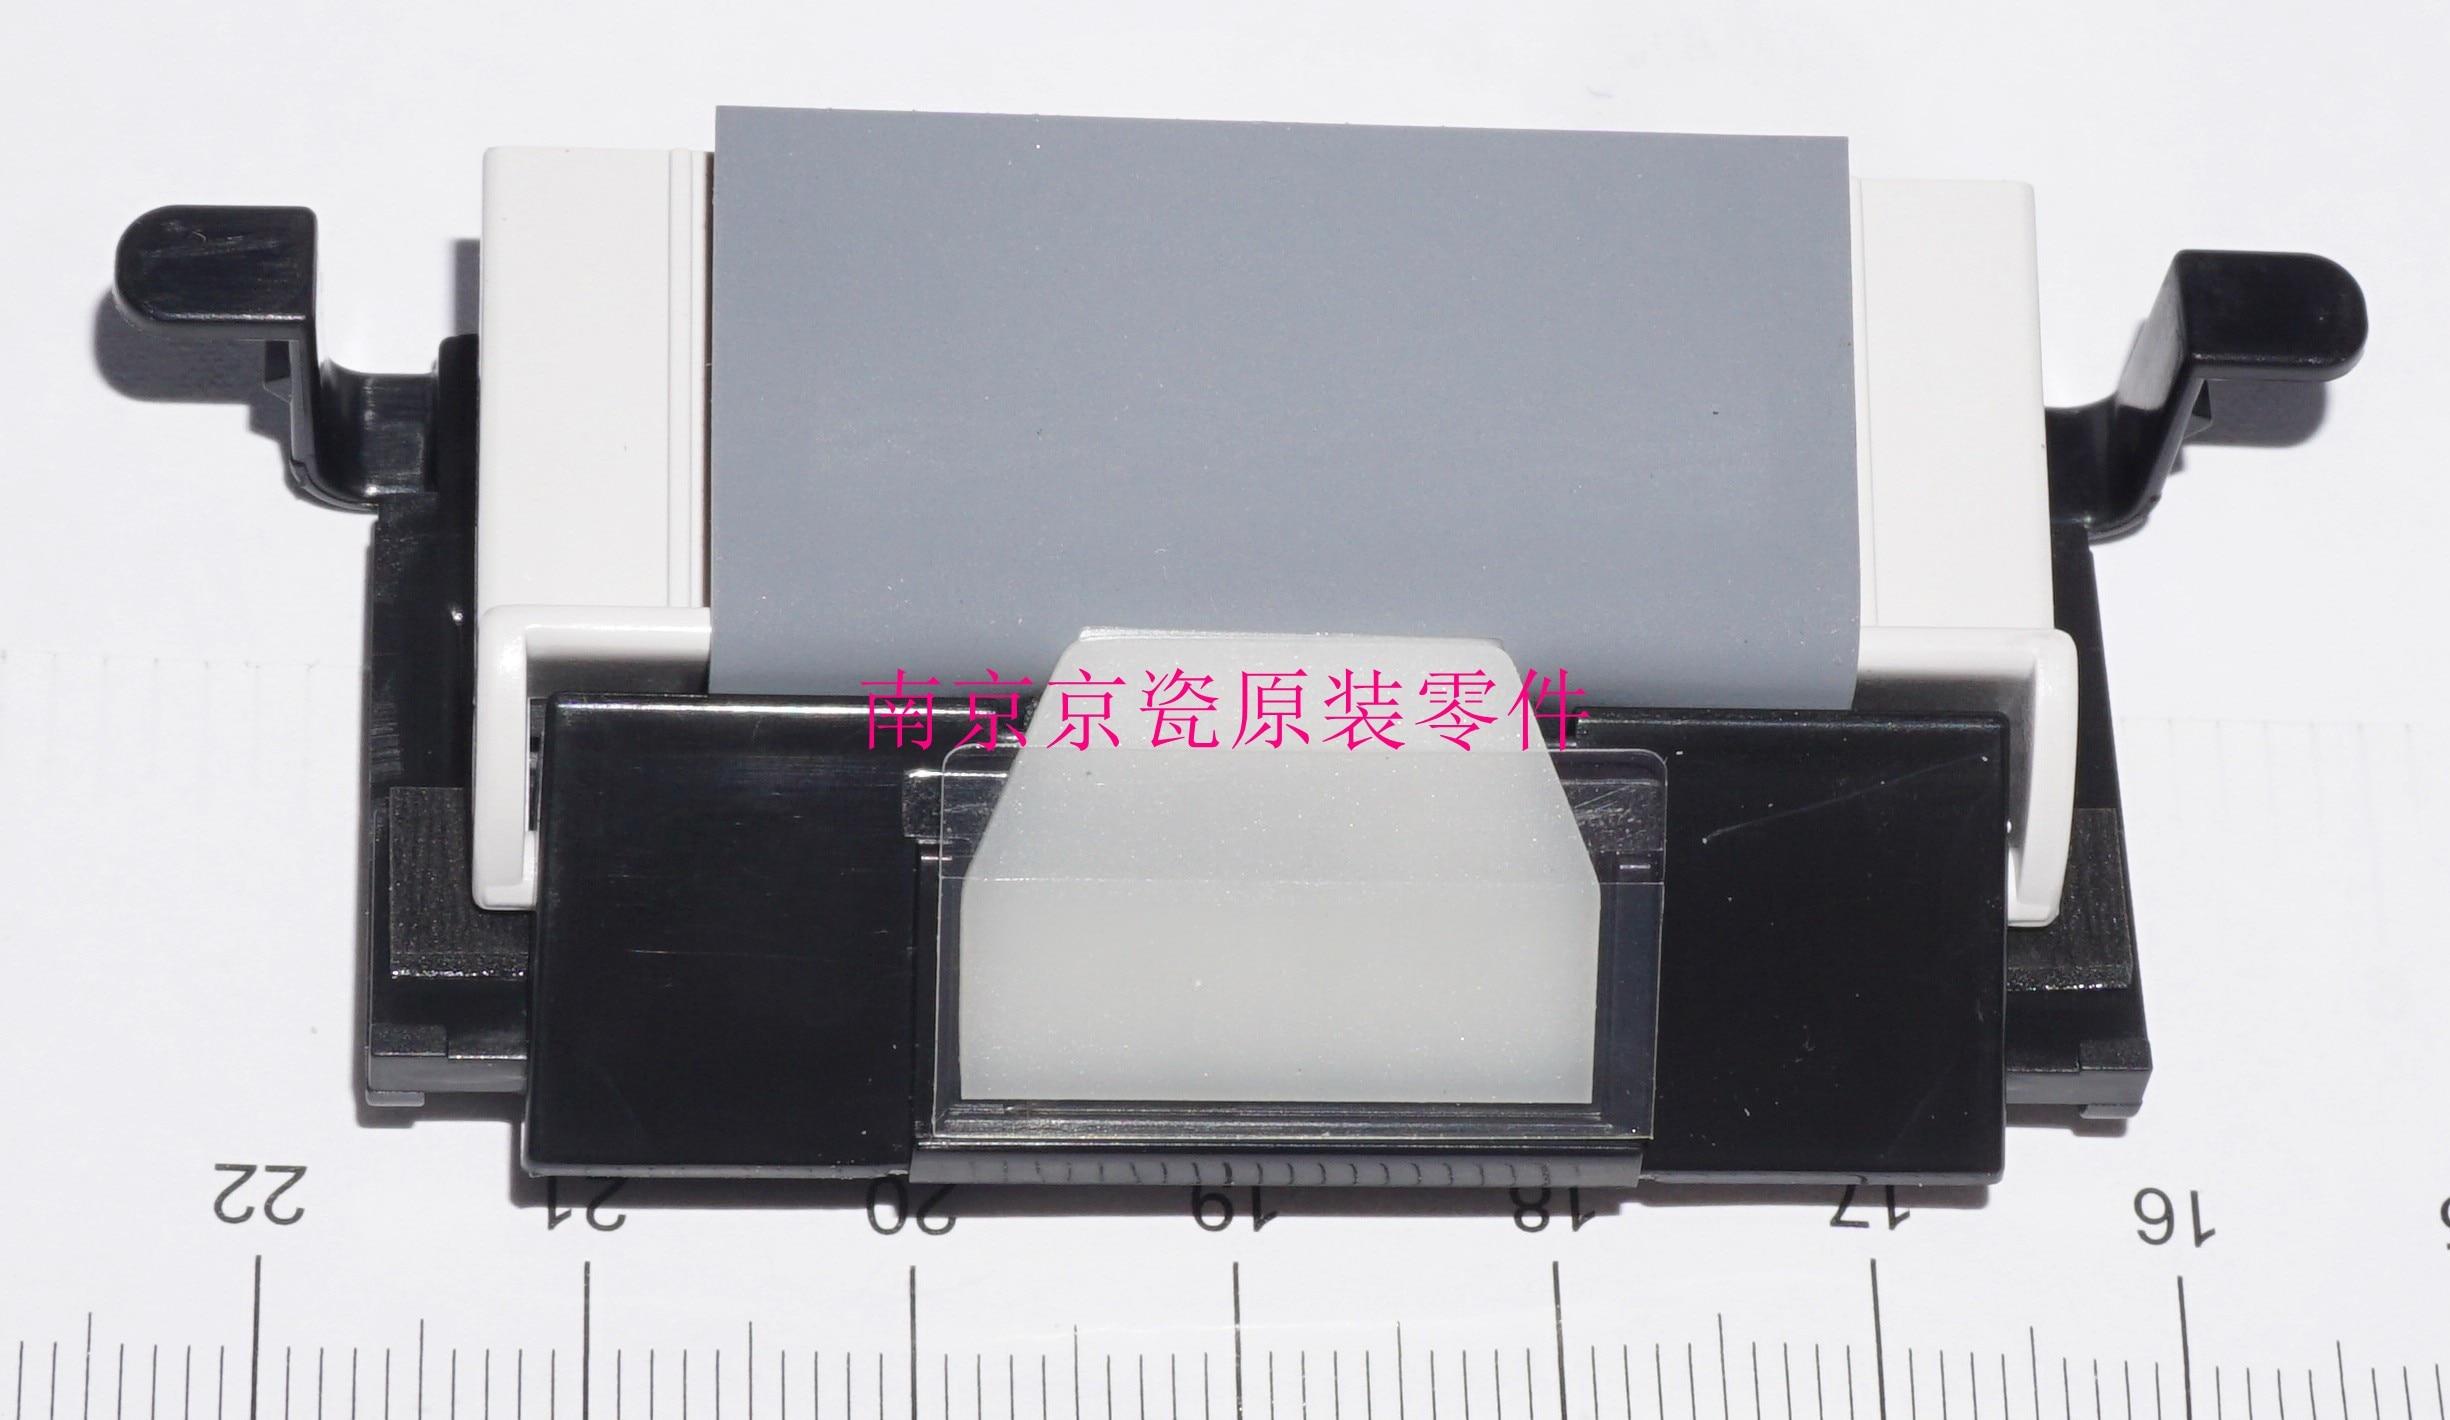 New Original Kyocera 302S094050 HOLDER PAD ASSY for:M2135 M2635 M2735|Printer Parts| |  - title=